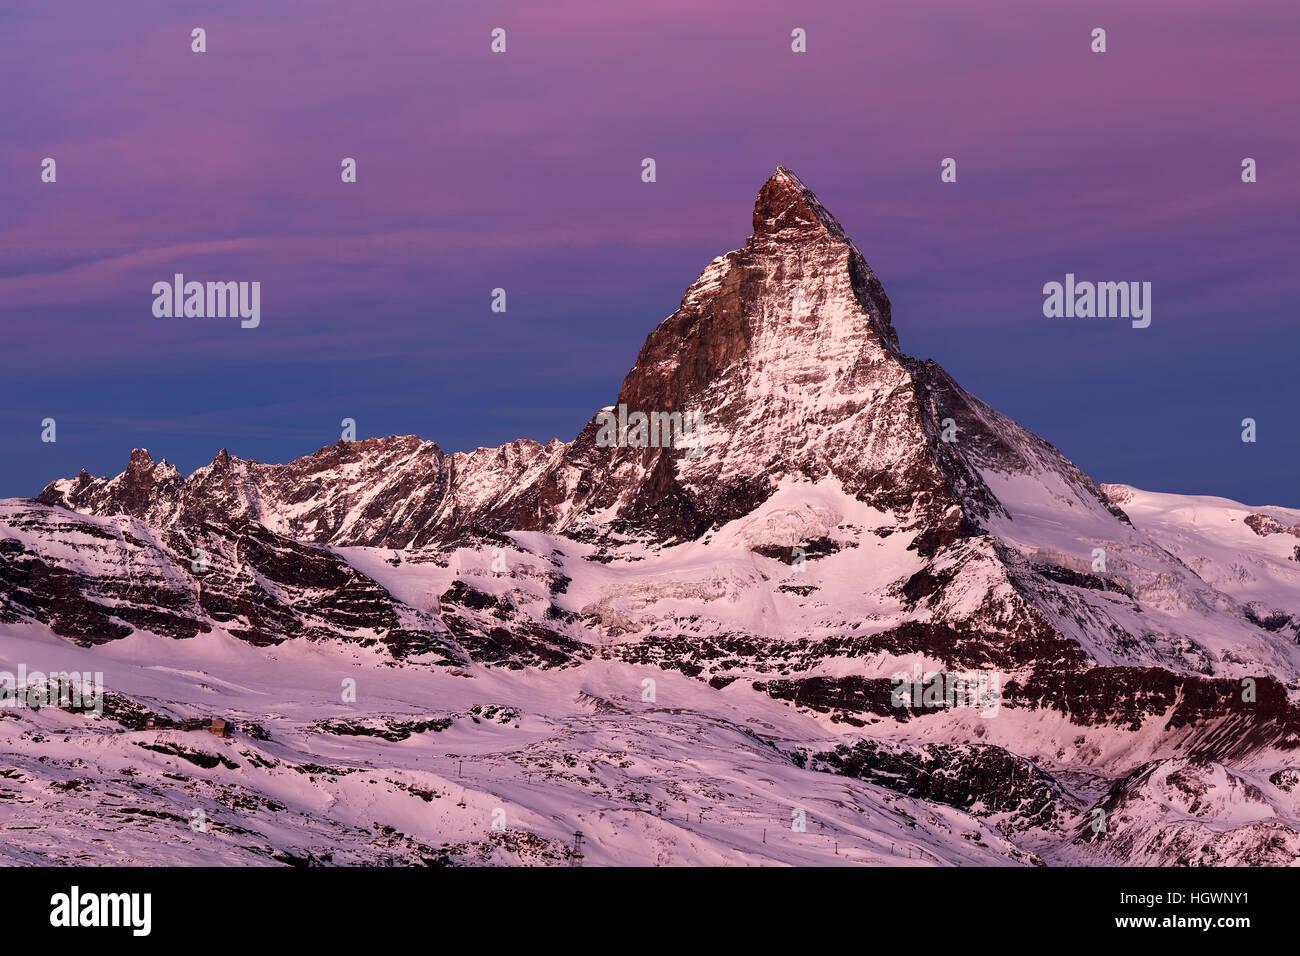 Cervino all'alba, Alpi del Vallese, Zermatt, Vallese, Svizzera Immagini Stock